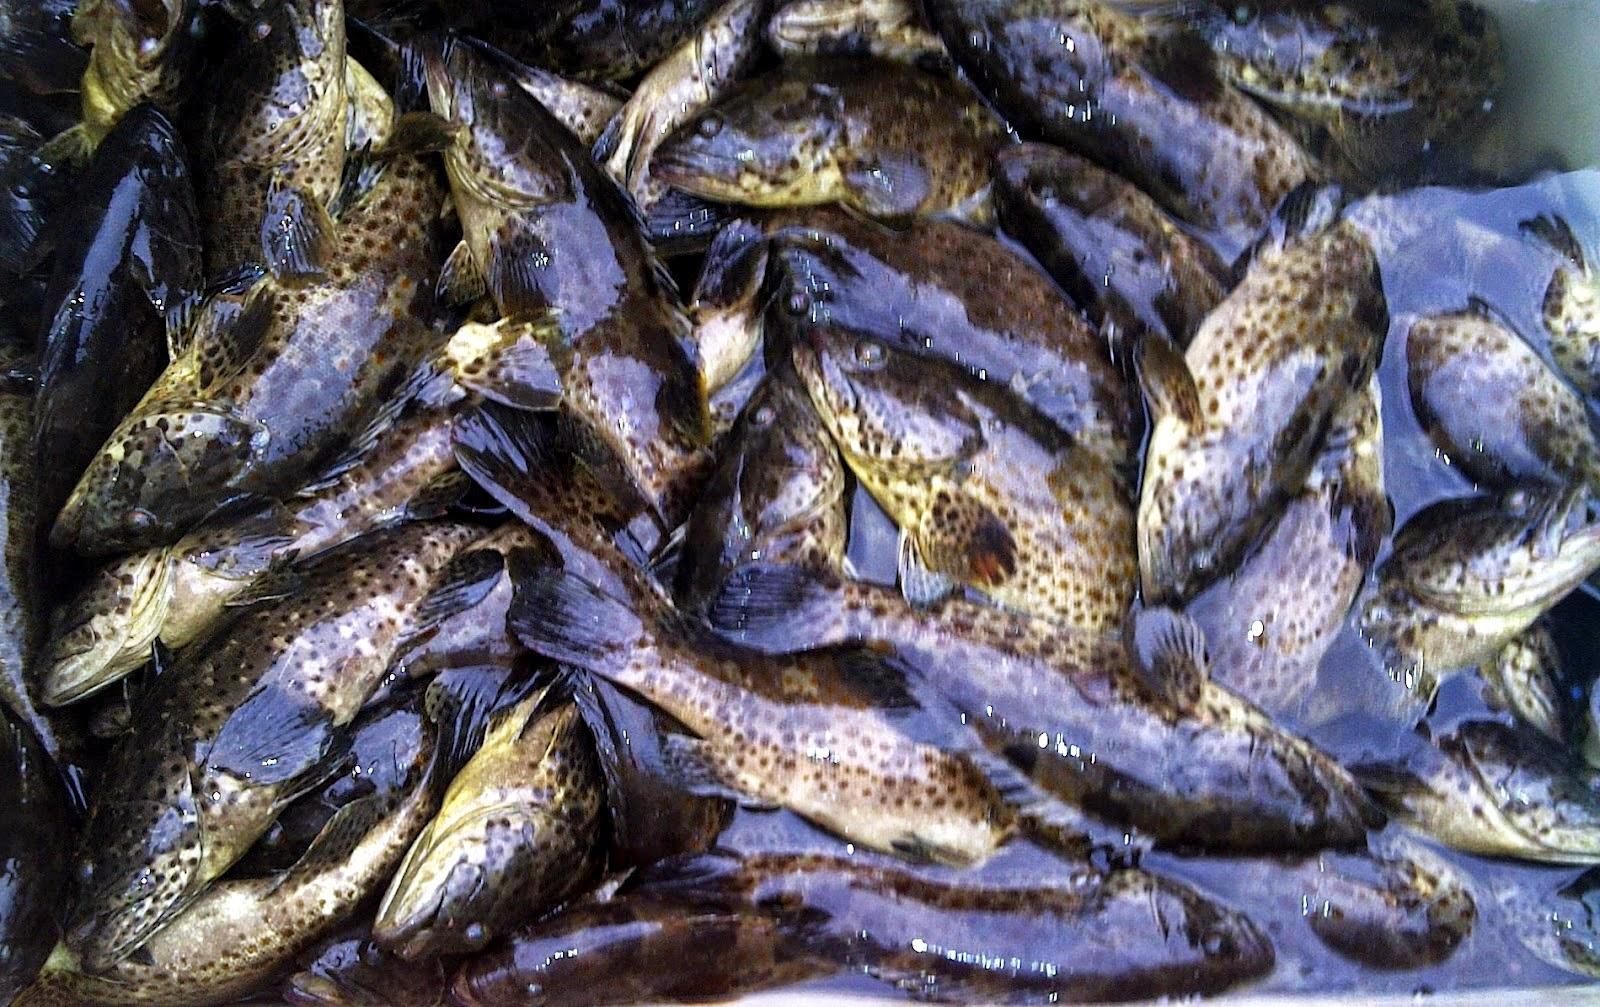 Panduan Cara Budidaya Ikan Kerapu